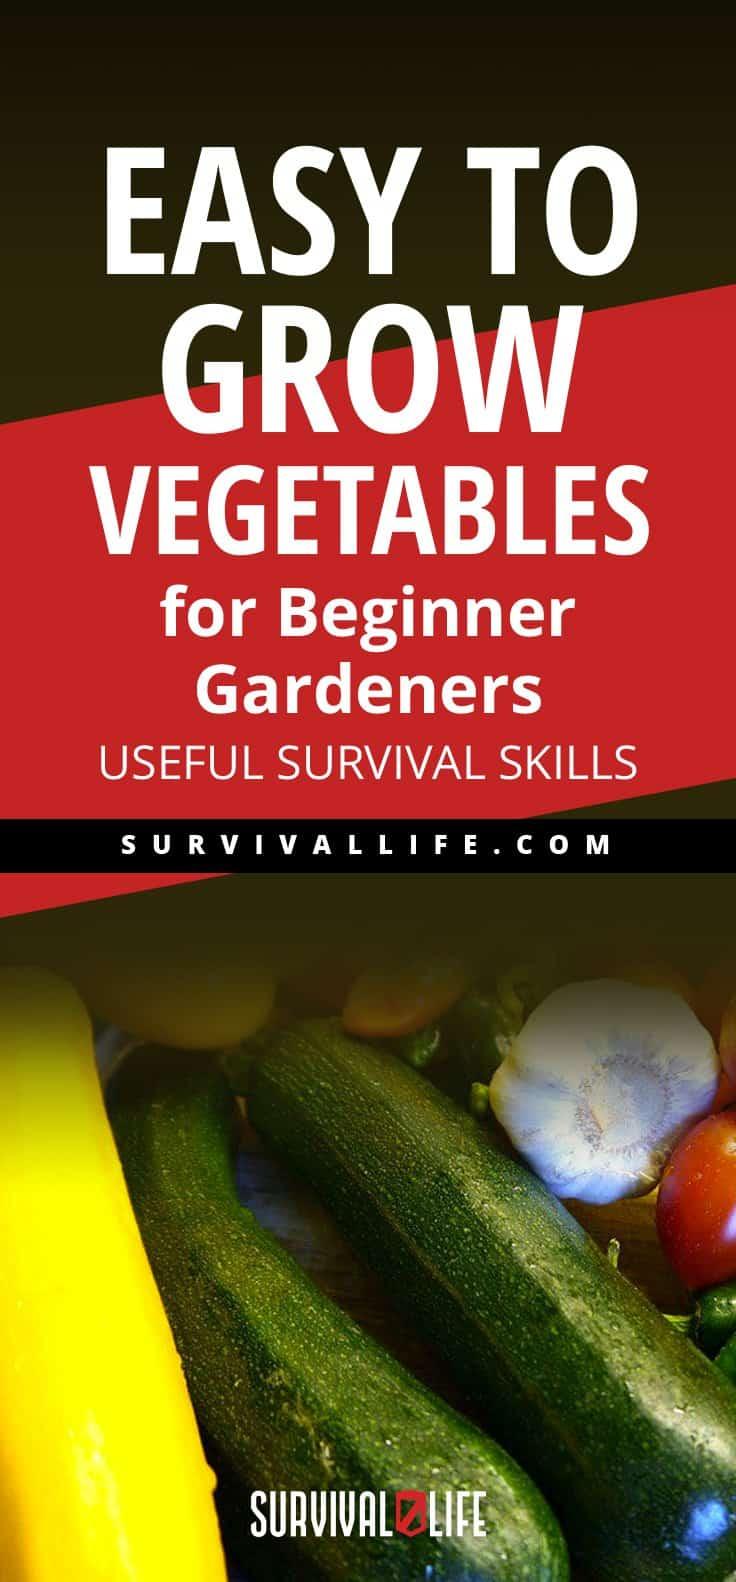 Easy To Grow Vegetables For Beginner Gardeners | Useful Survival Skills